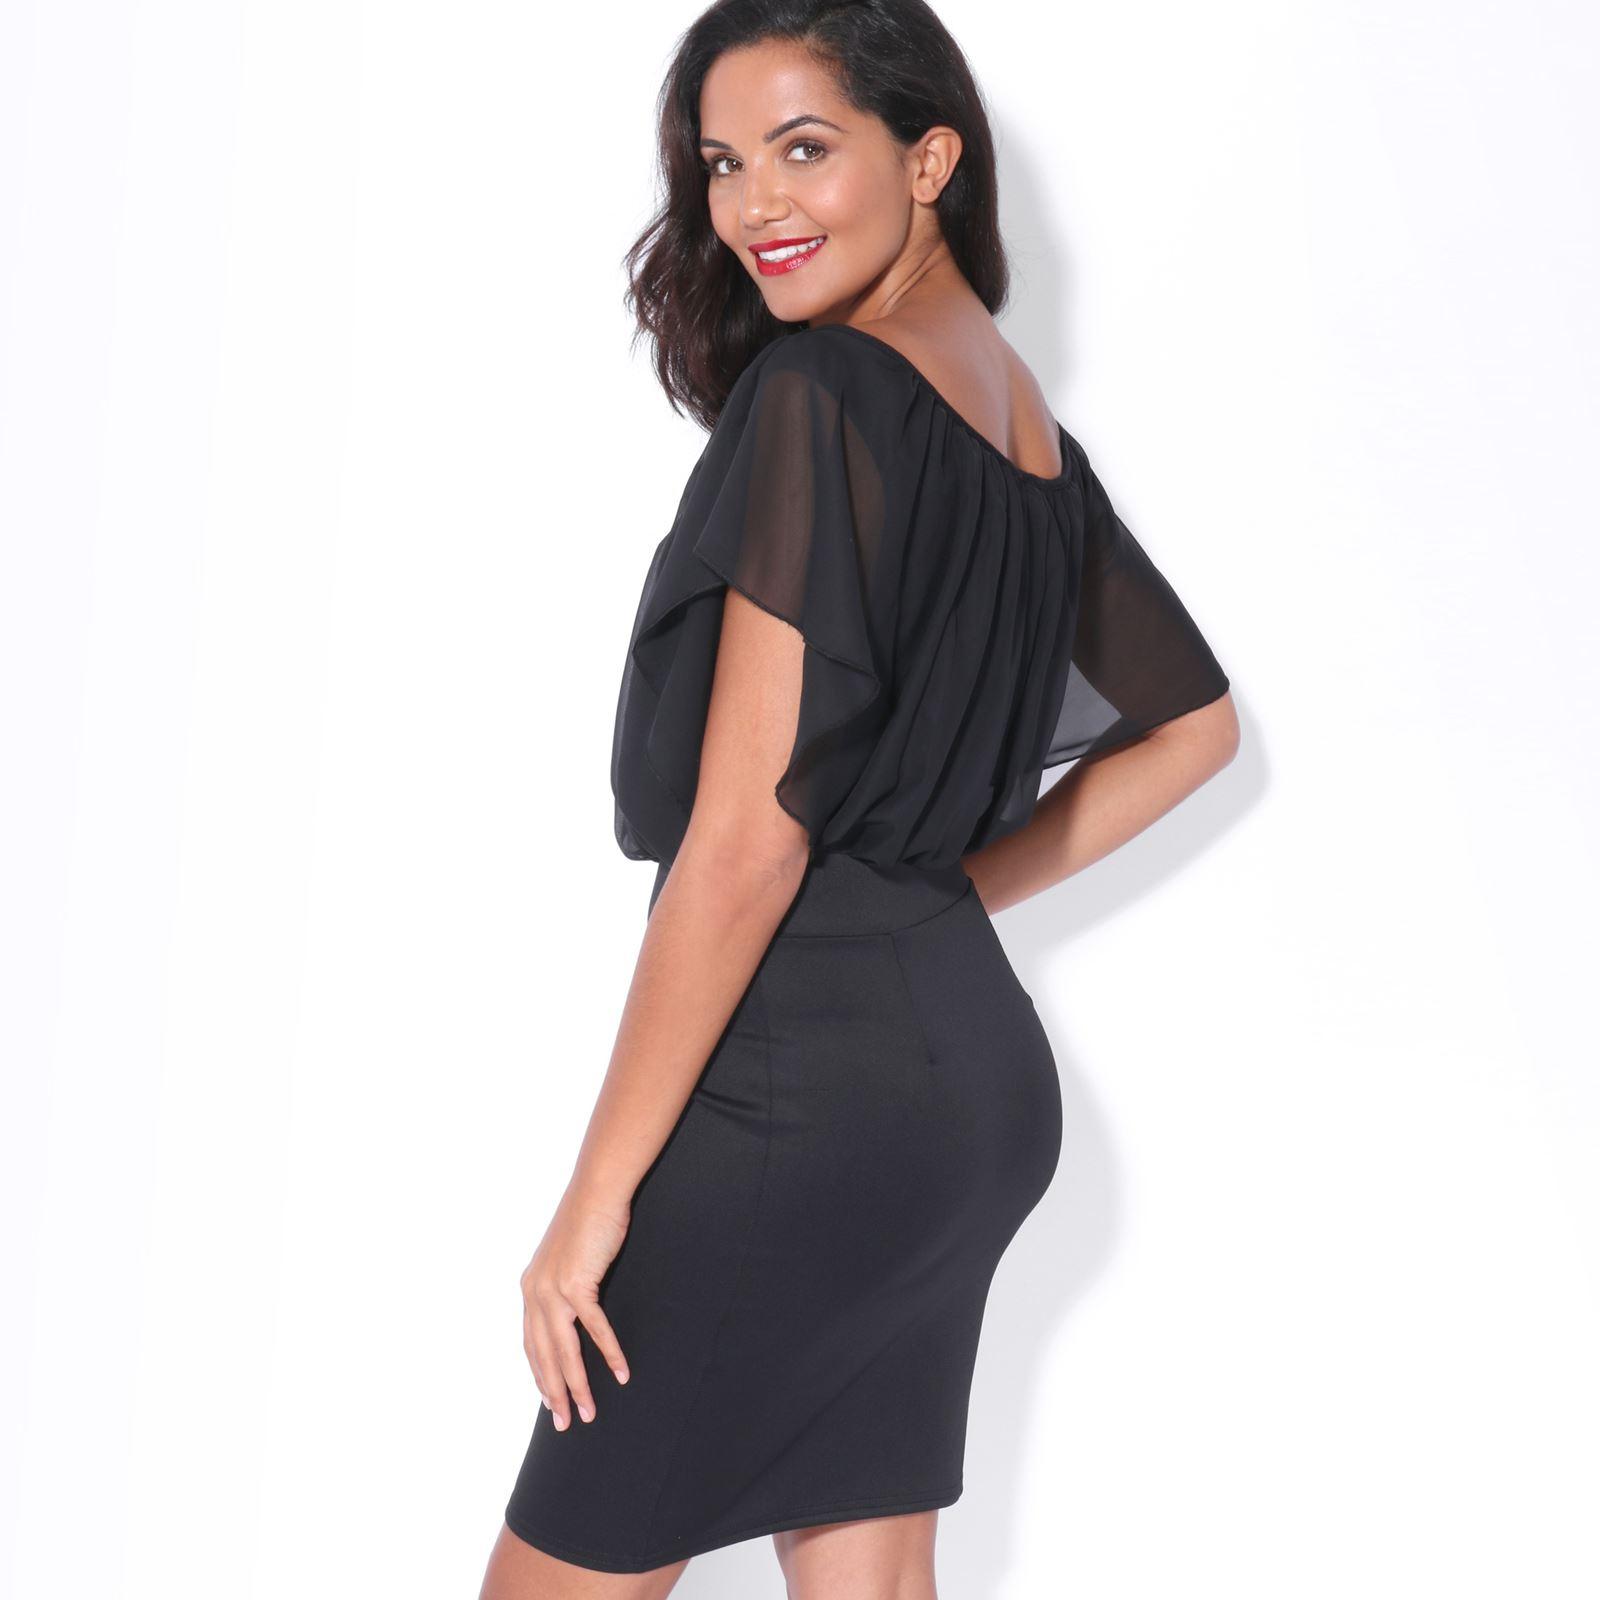 Womens-Pleated-Chiffon-Batwing-Top-High-Waist-Pencil-Bodycon-Skirt-Mini-Dress thumbnail 7